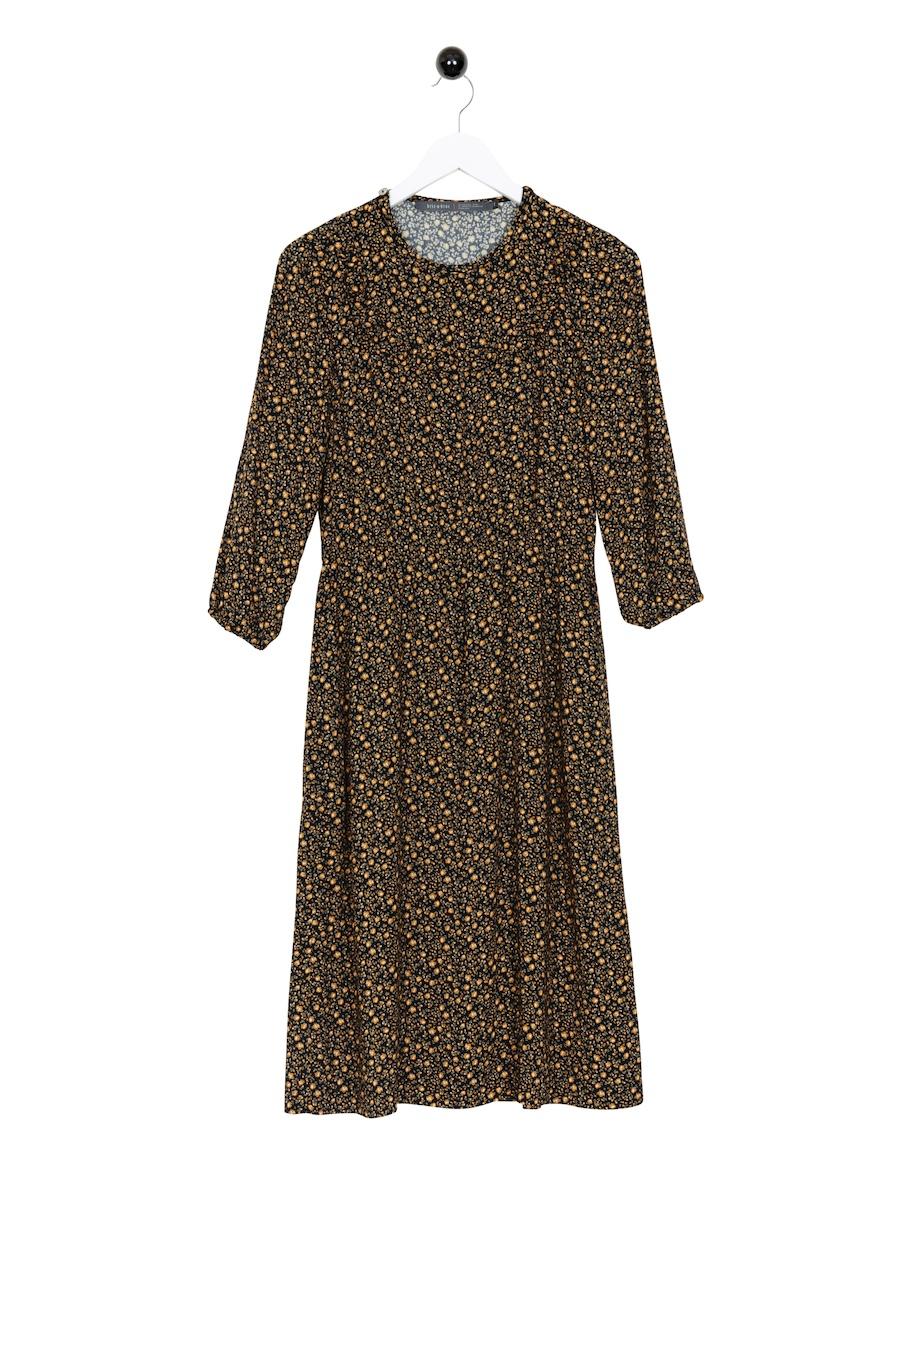 Coulport Dress